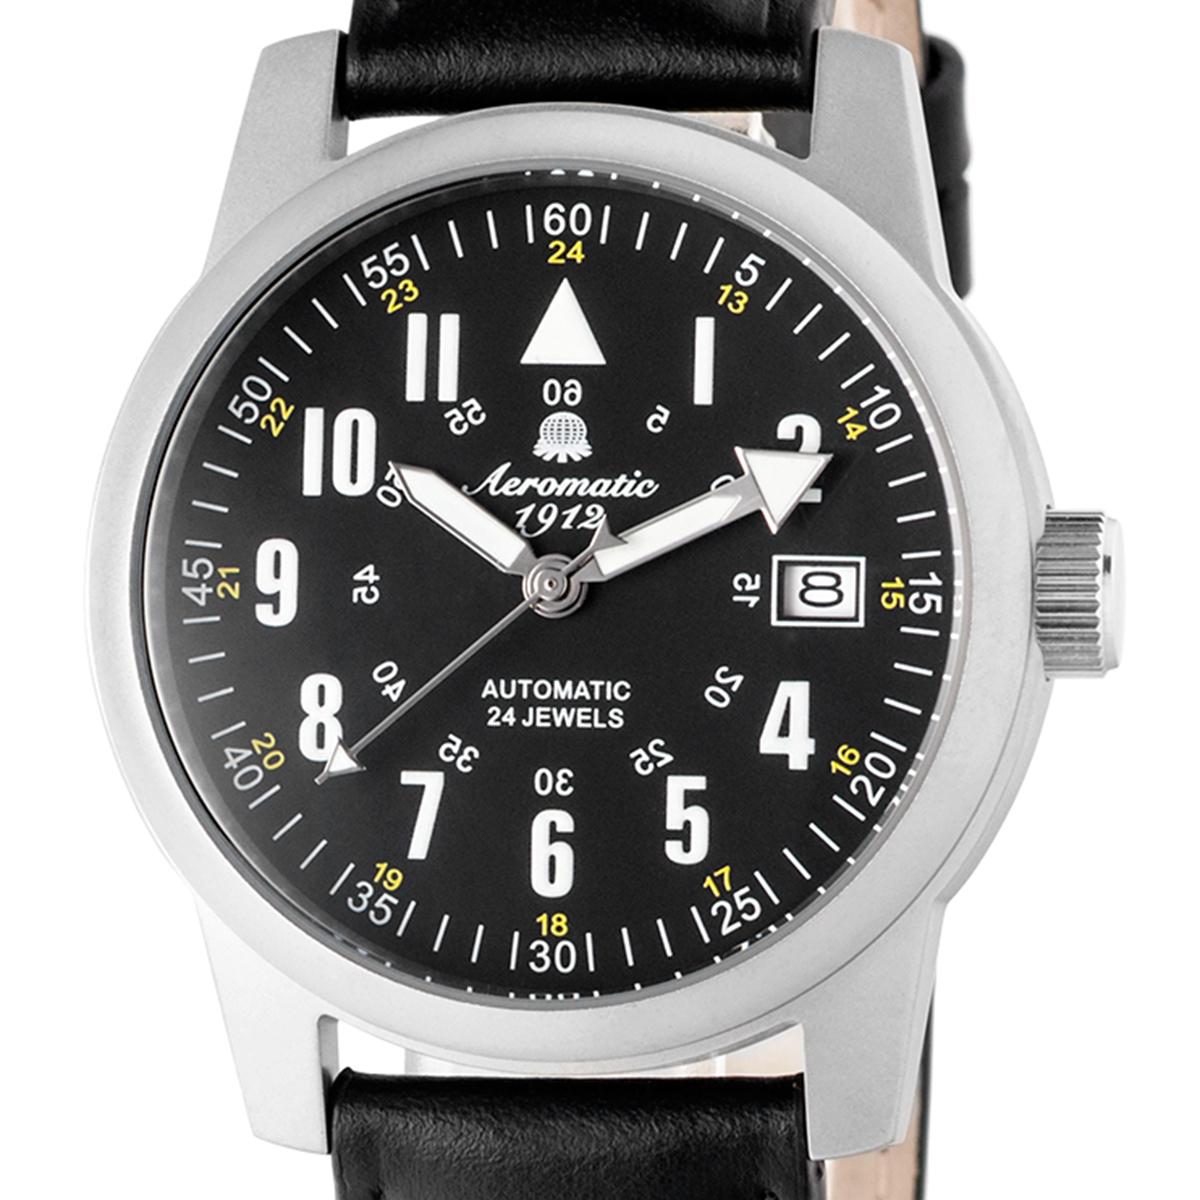 Aeromatic1912 エアロマティック1912 自動巻き(手巻き機能あり) 腕時計 [A1027X] 正規代理店品  デイト